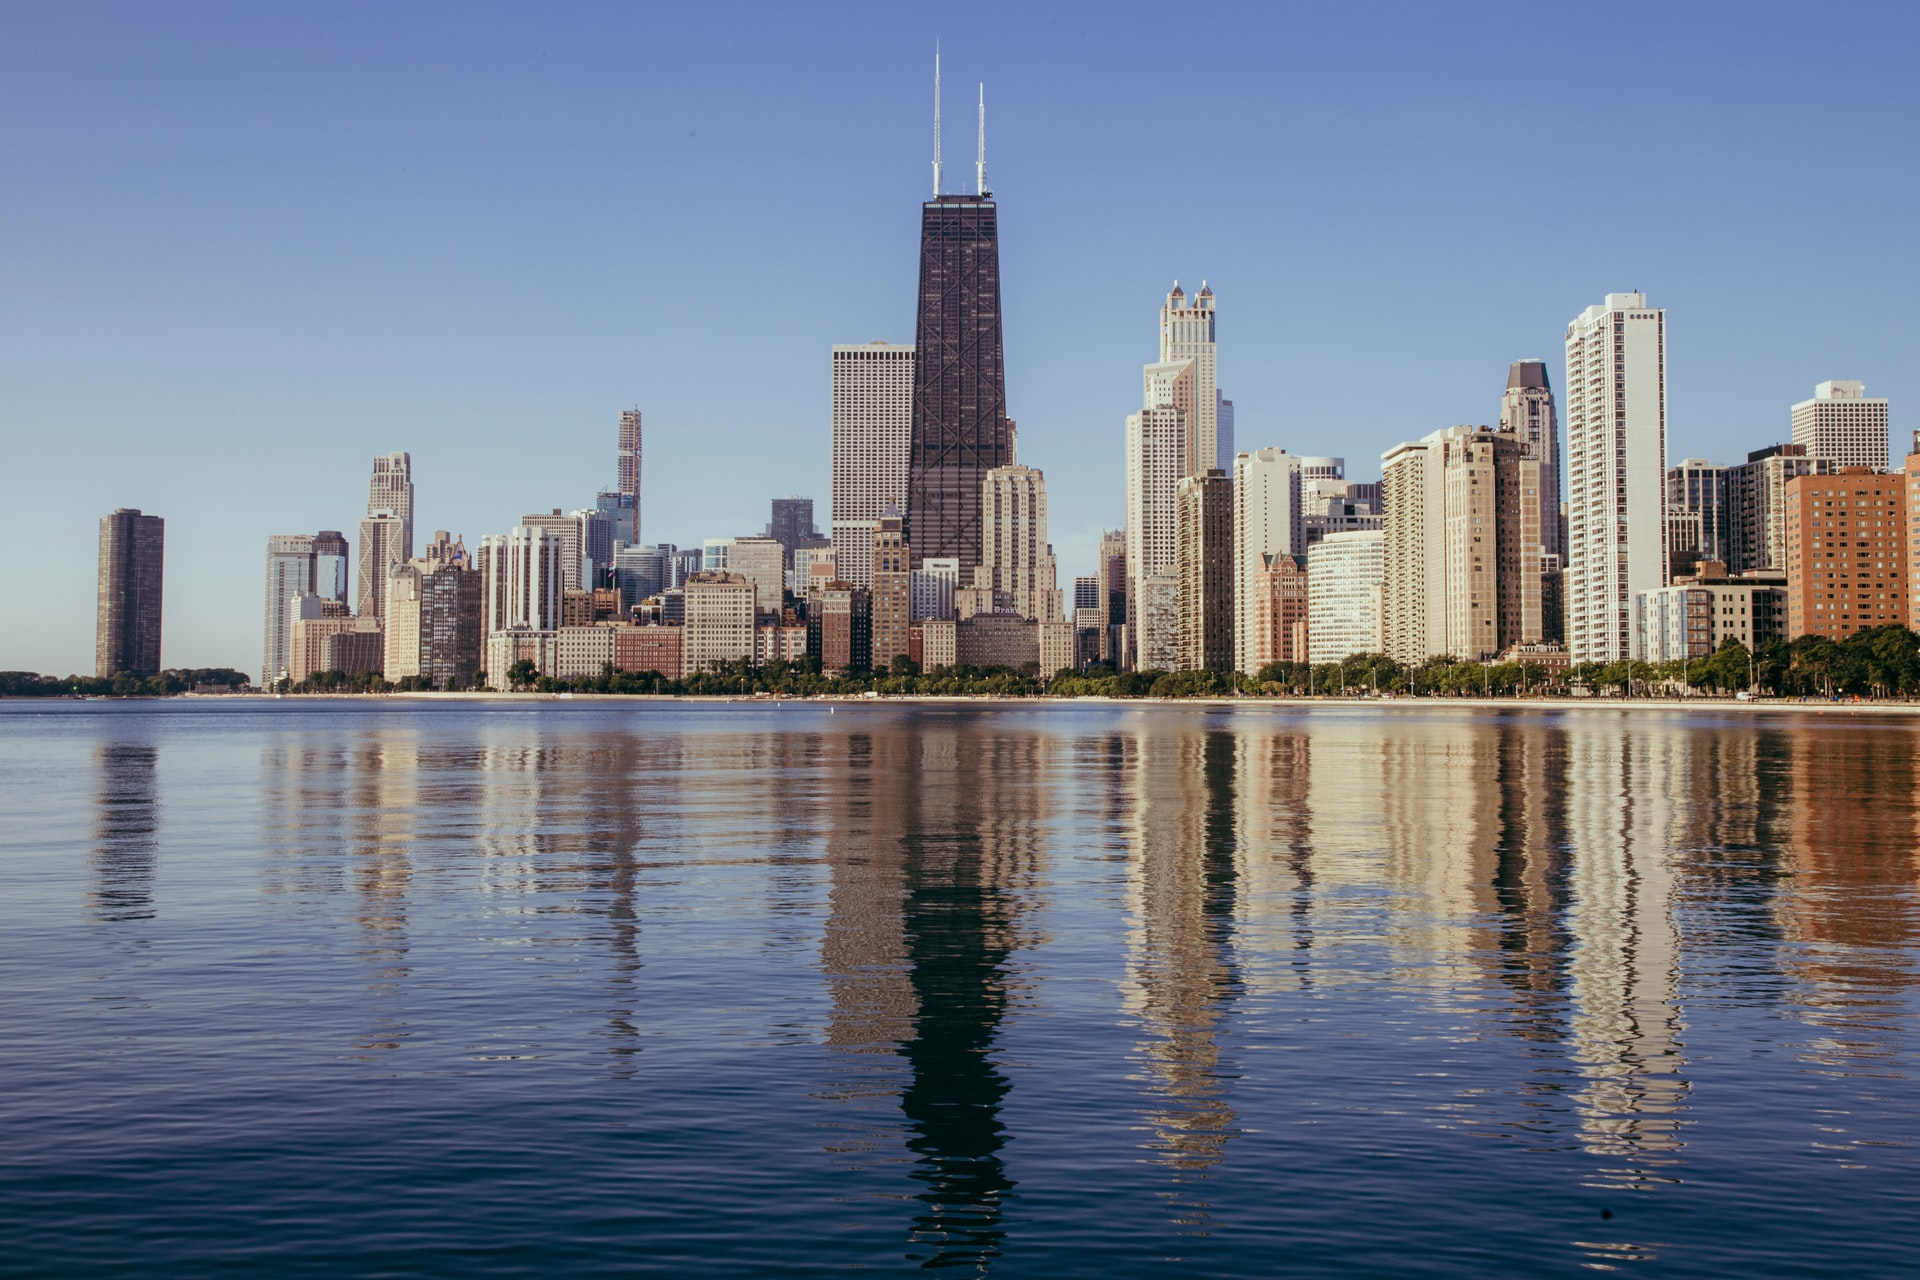 Chicago Casinos Make Your Vacation Even Better Americancasinoguide